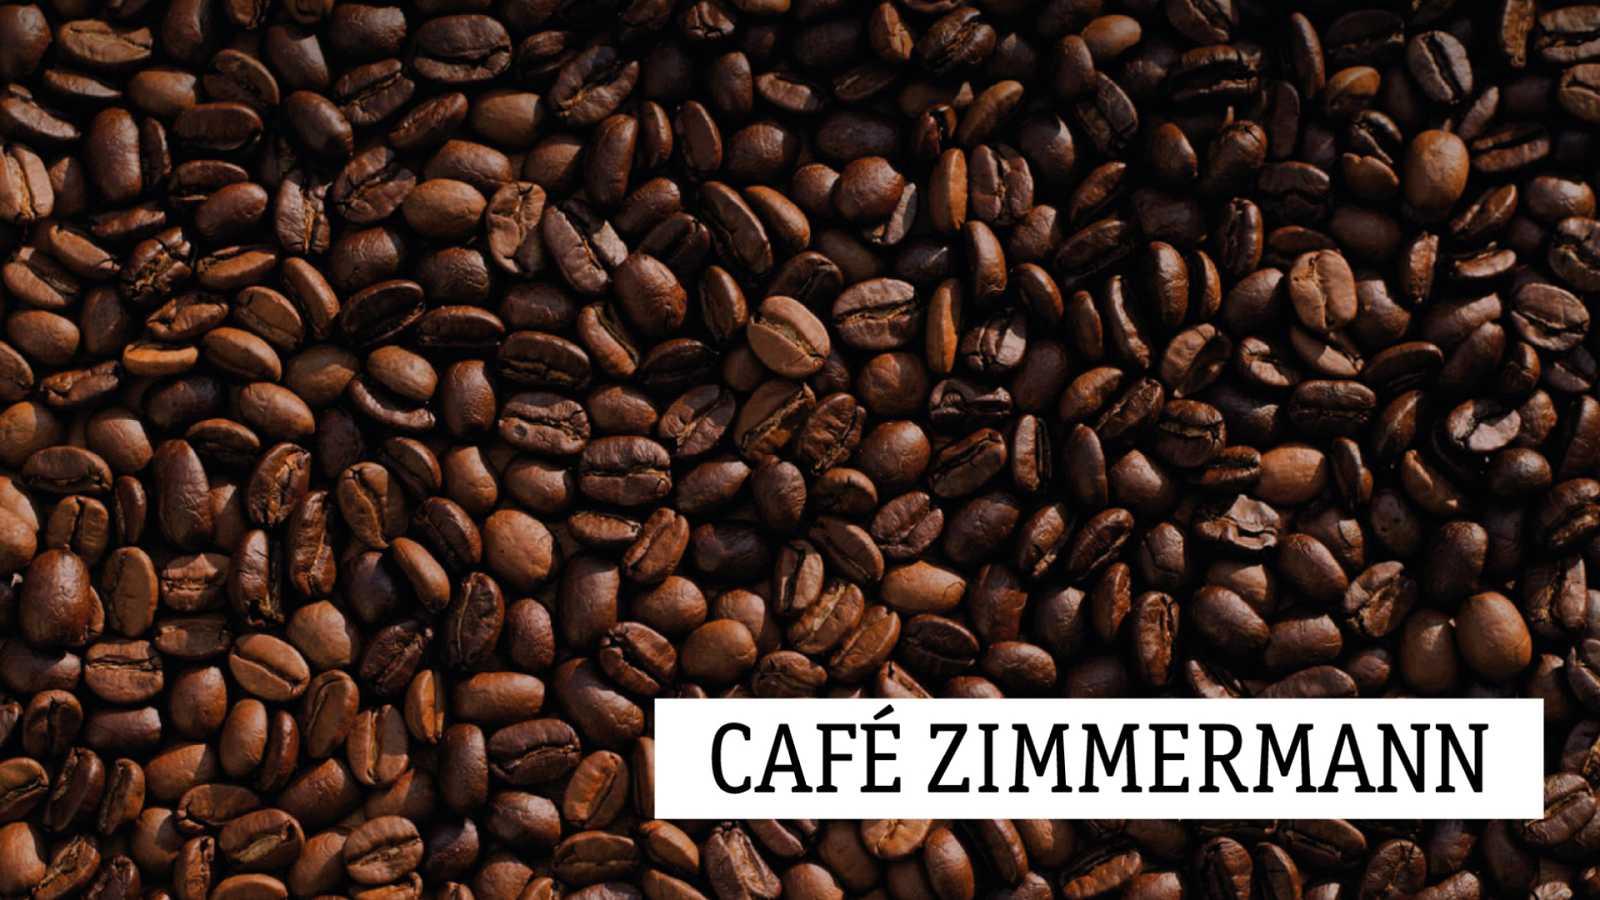 Café Zimmermann - Alfred Schnittke: Sonata para violonchelo y piano núm. 1 - 03/05/21 - escuchar ahora